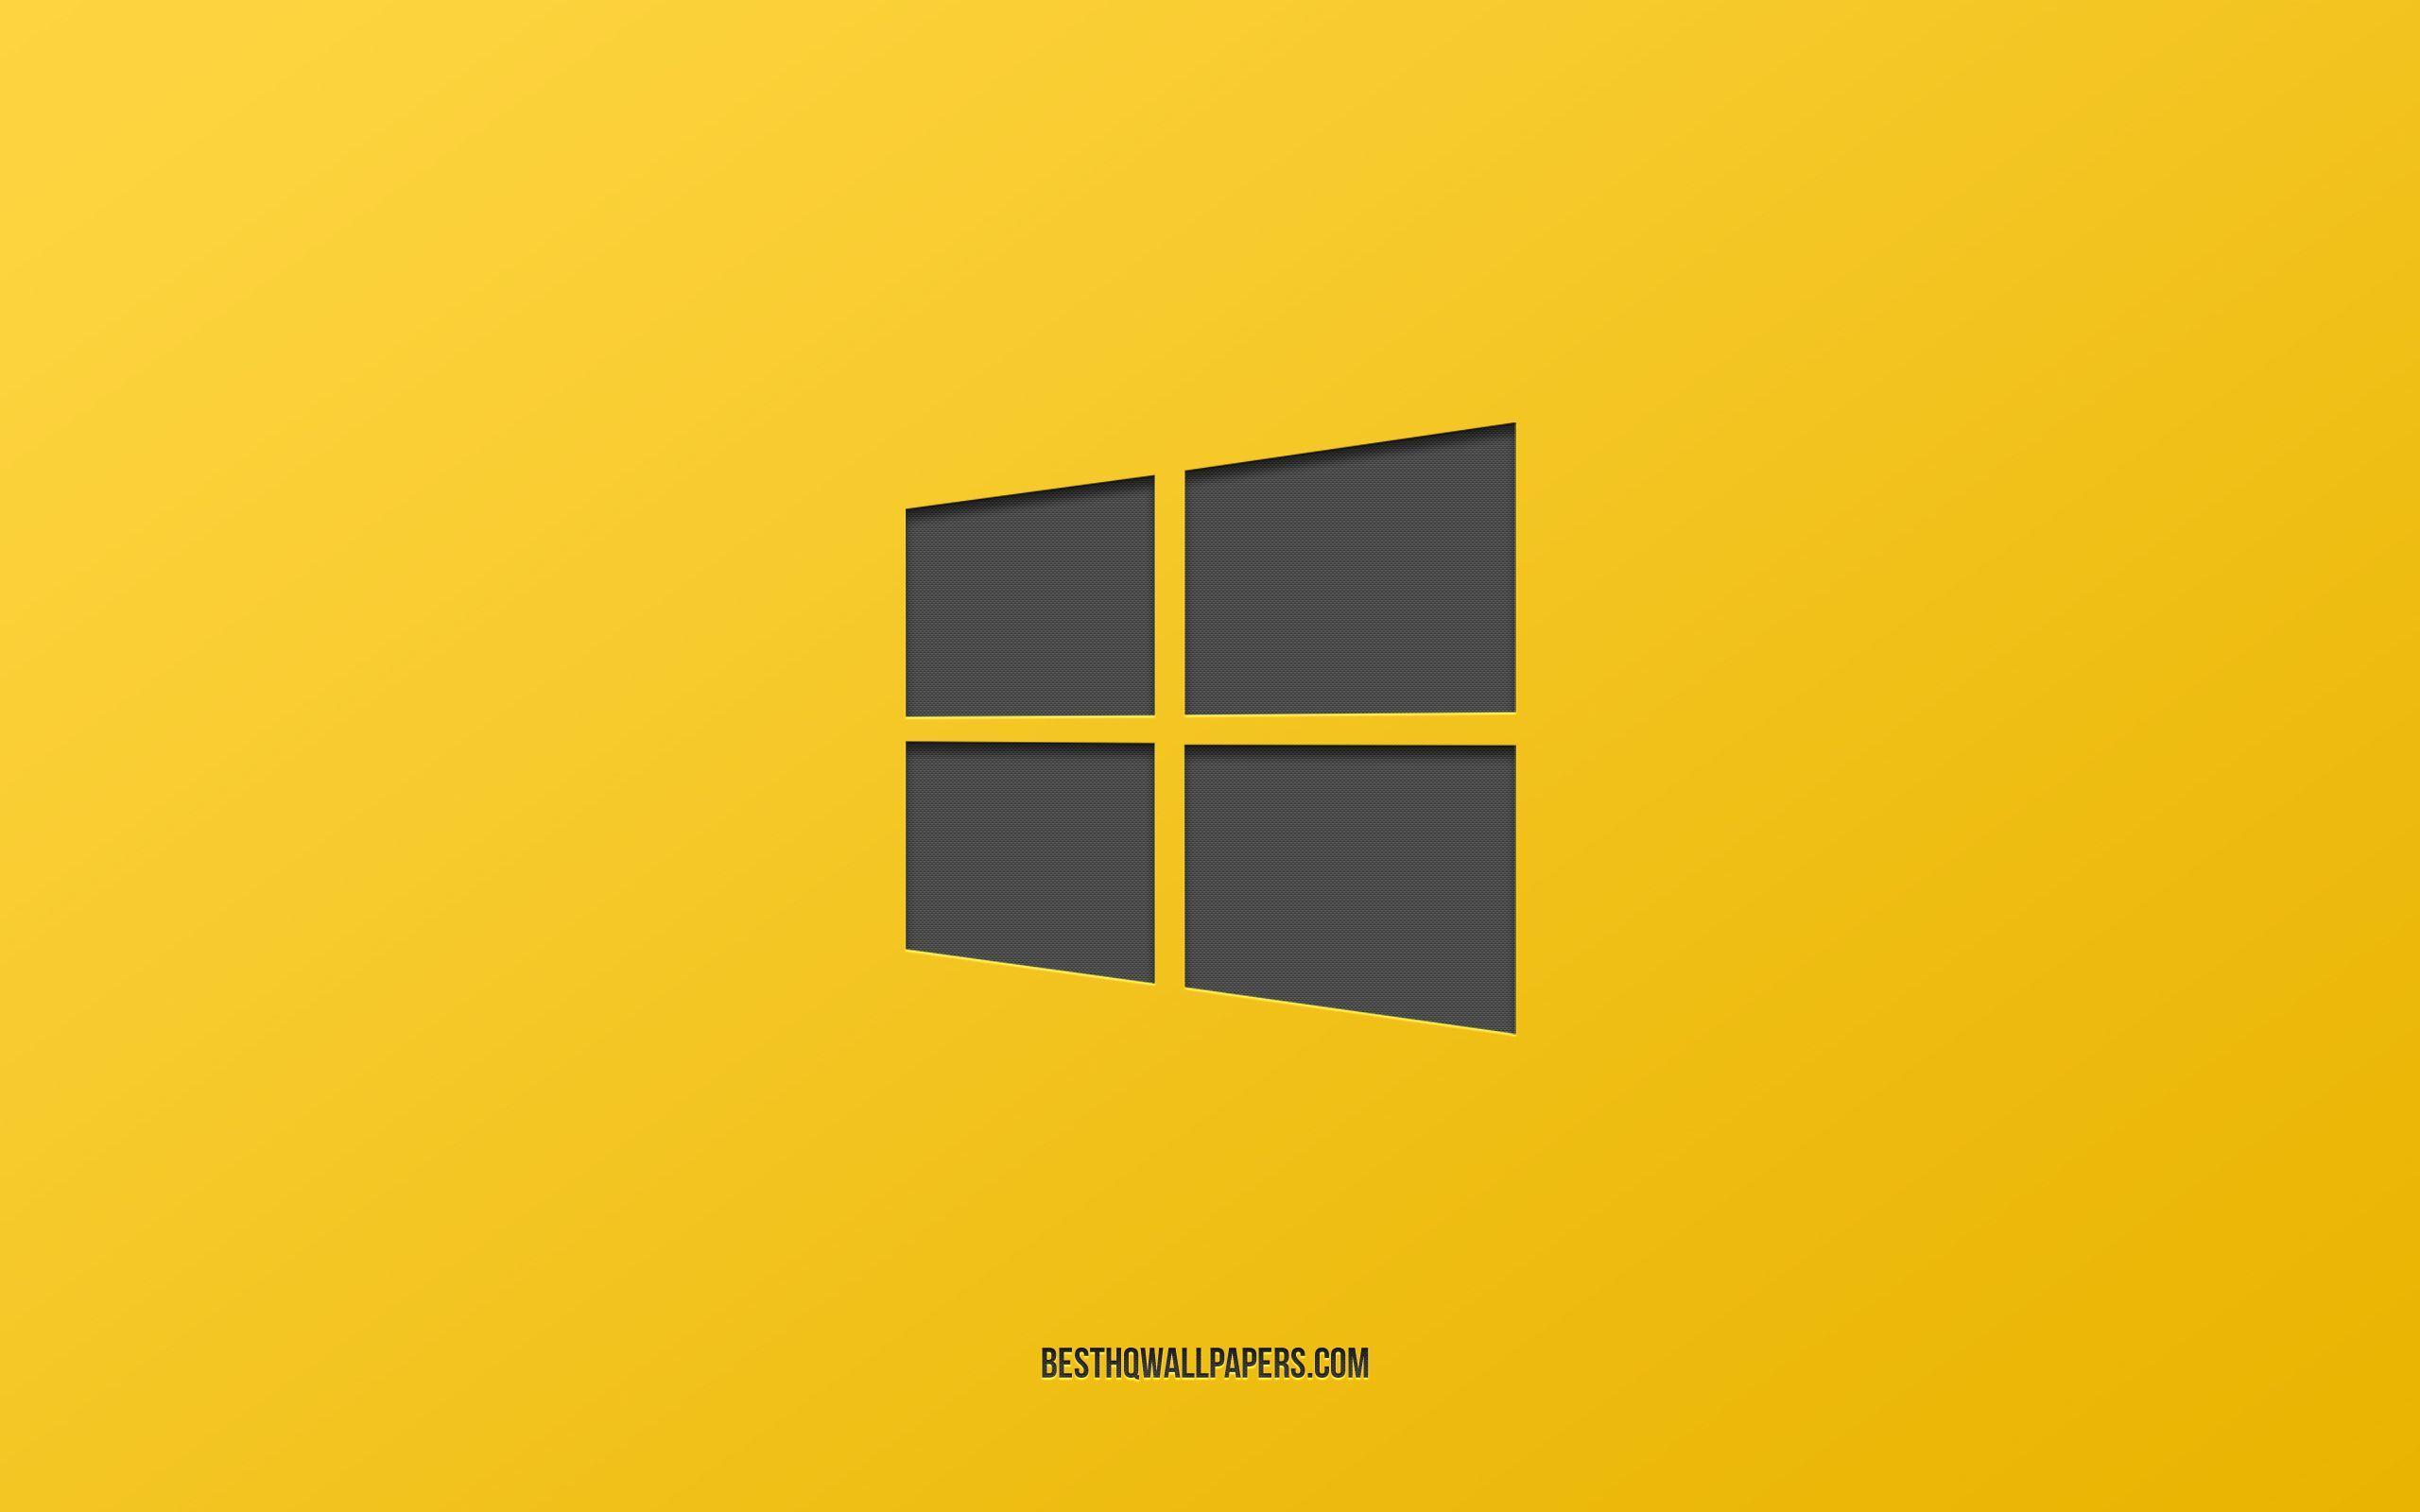 Windows 10 Yellow Wallpaper Hd